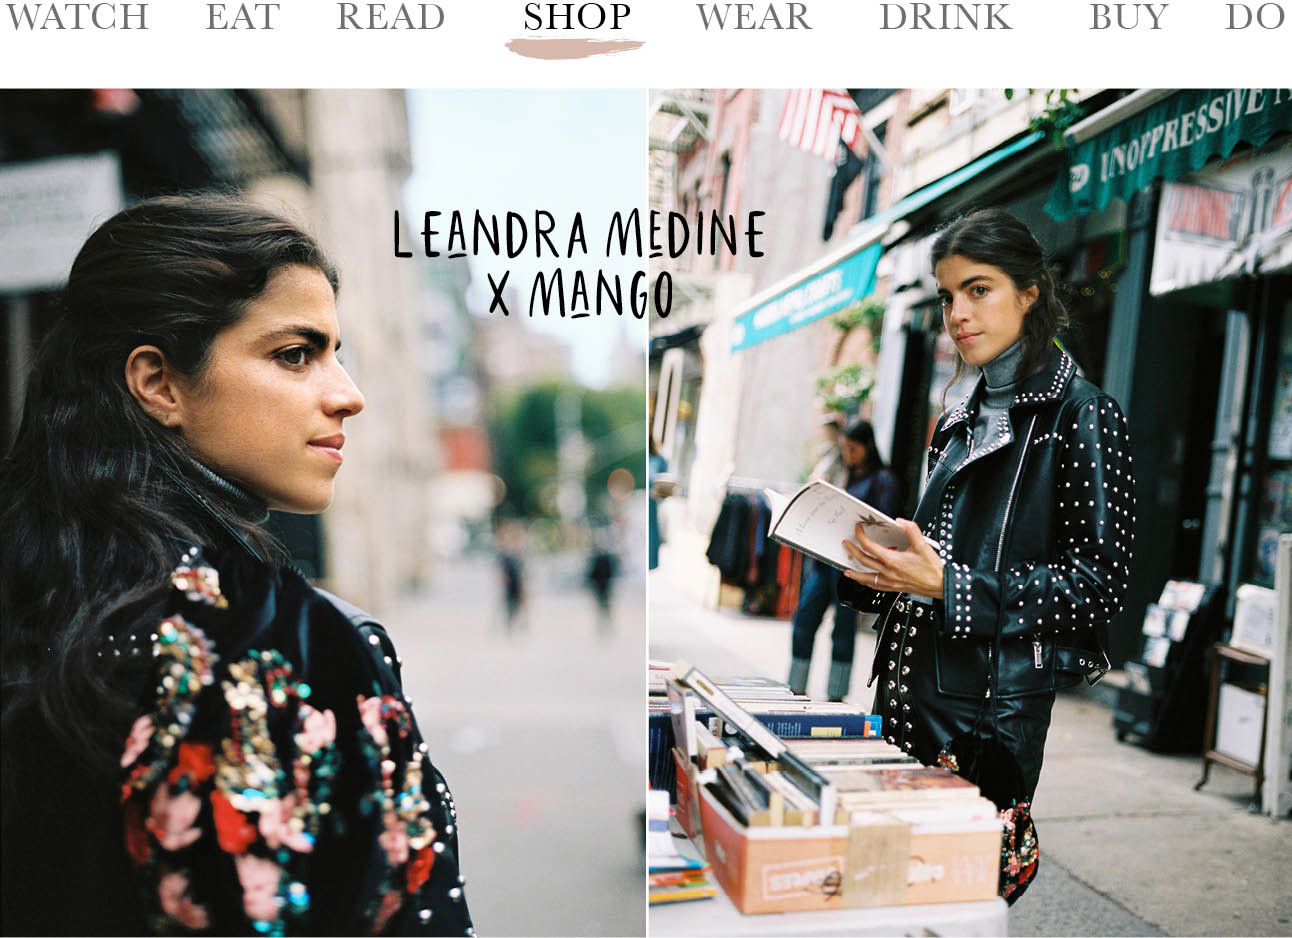 Today we shop - Leandra Medine x Mango